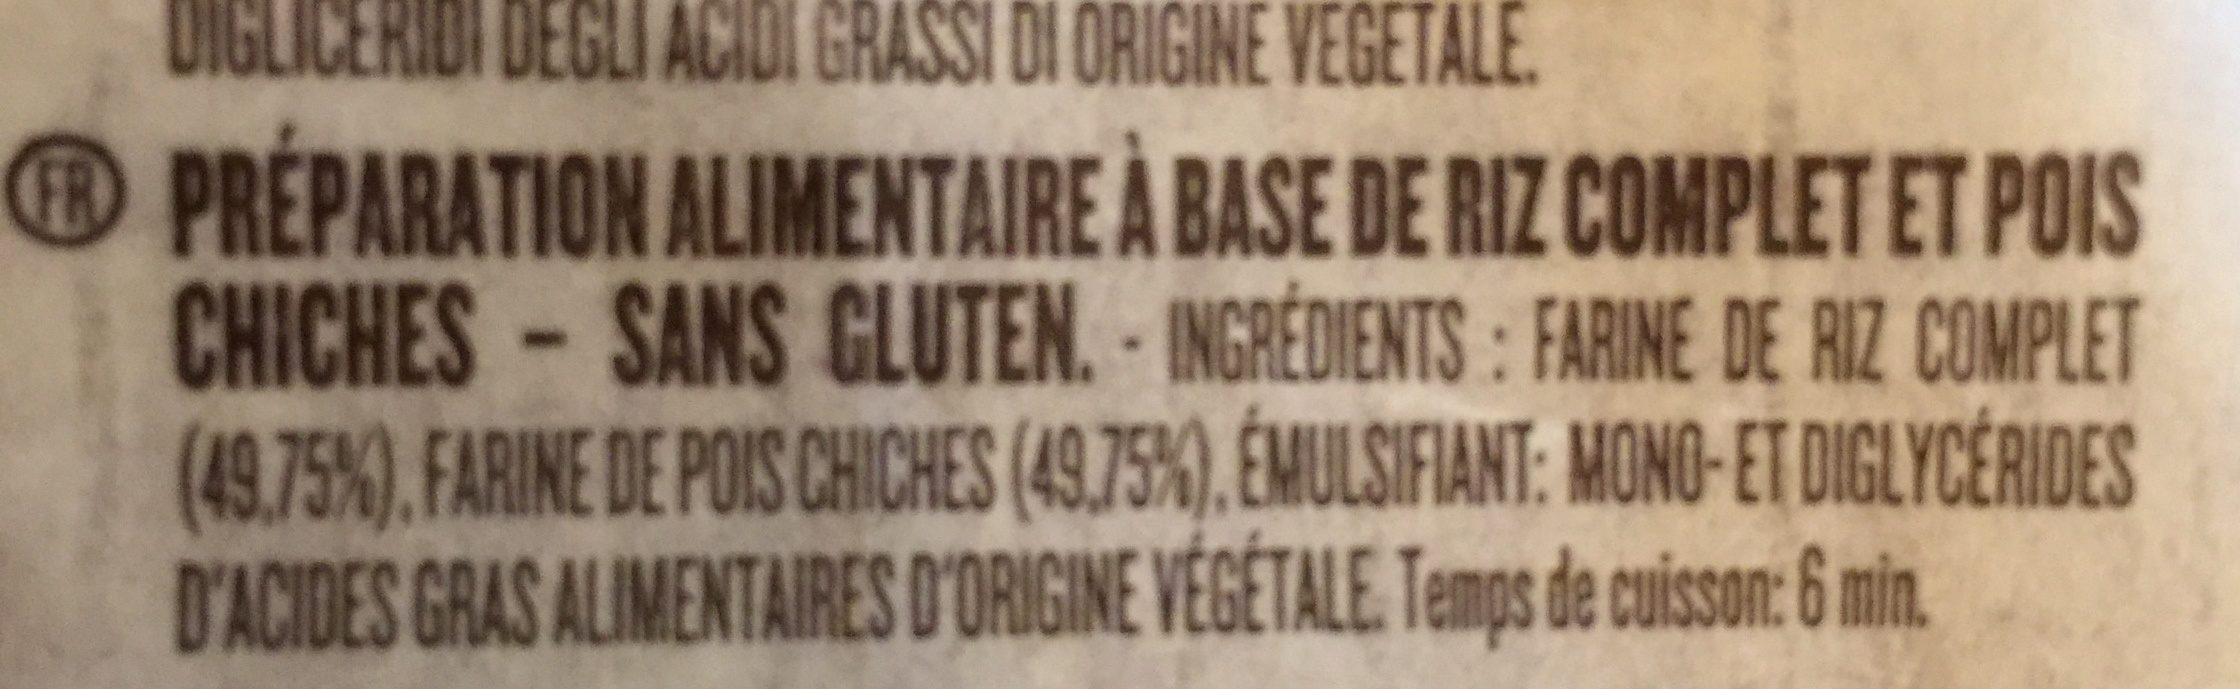 Penne rigate 66 - Ingredients - fr